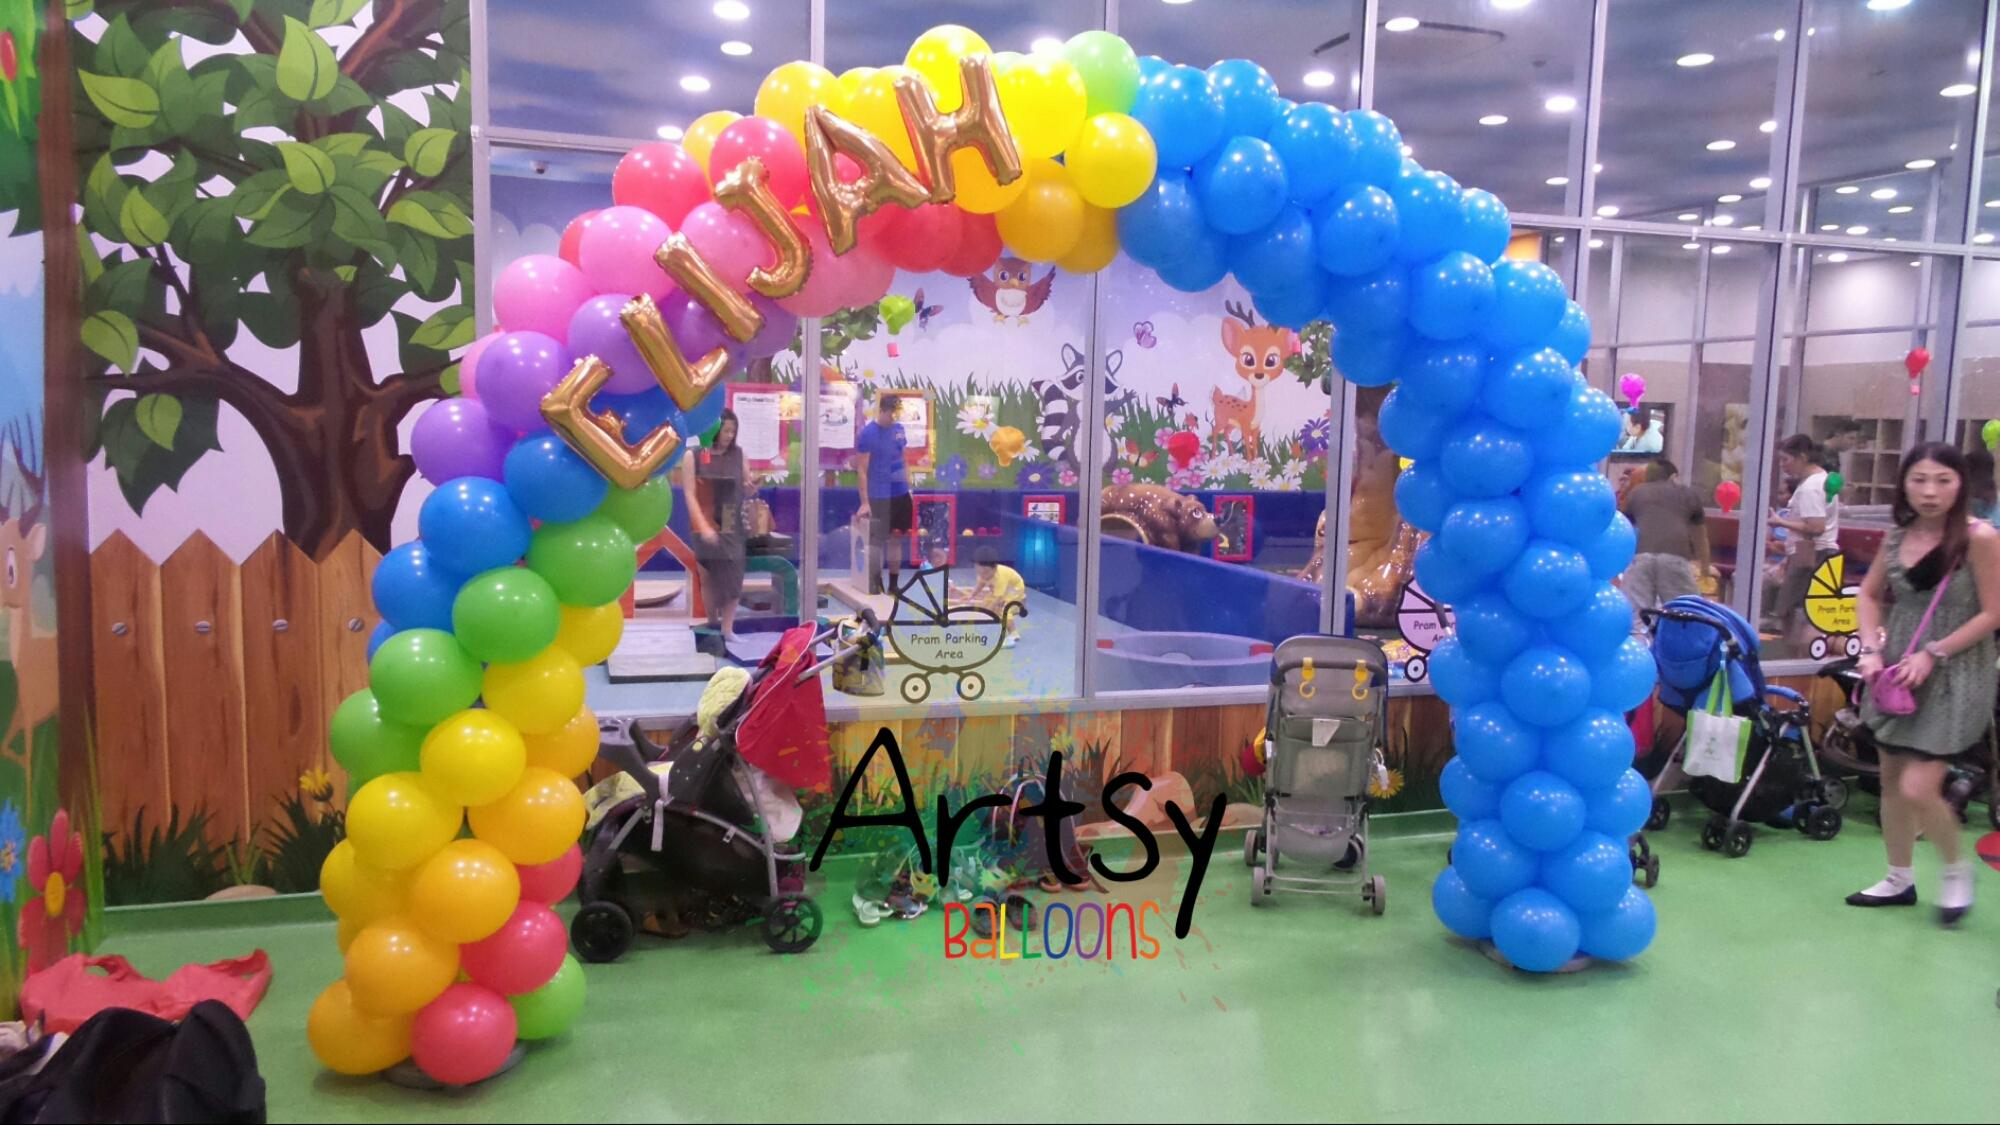 , Raimbow balloon arch for Elijah! – Part 1, Singapore Balloon Decoration Services - Balloon Workshop and Balloon Sculpting